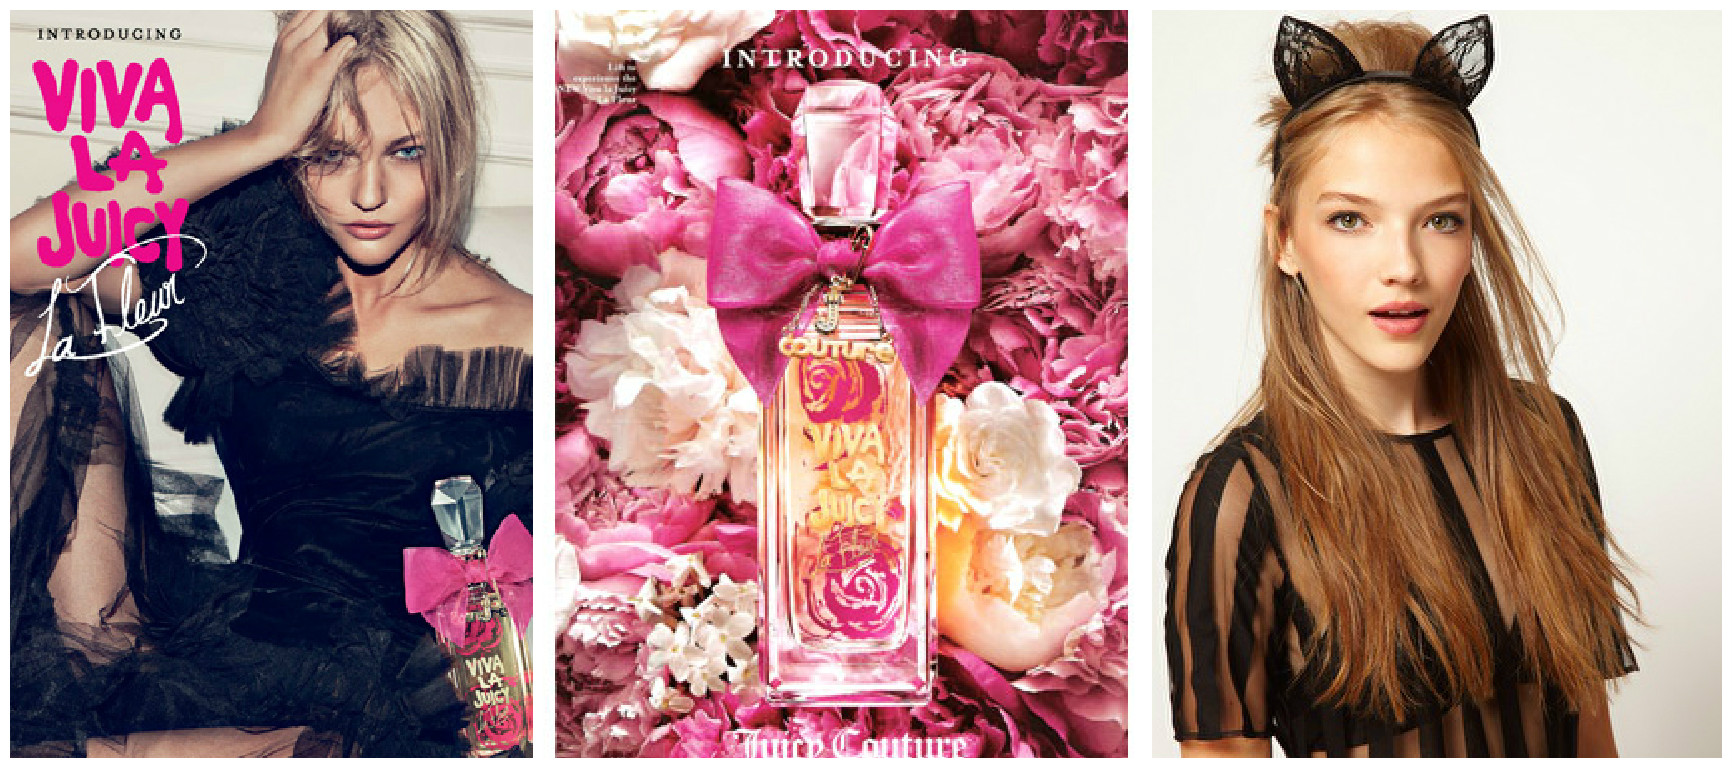 Perfume of the Day: Viva La Juicy La Fleur by Juicy Couture